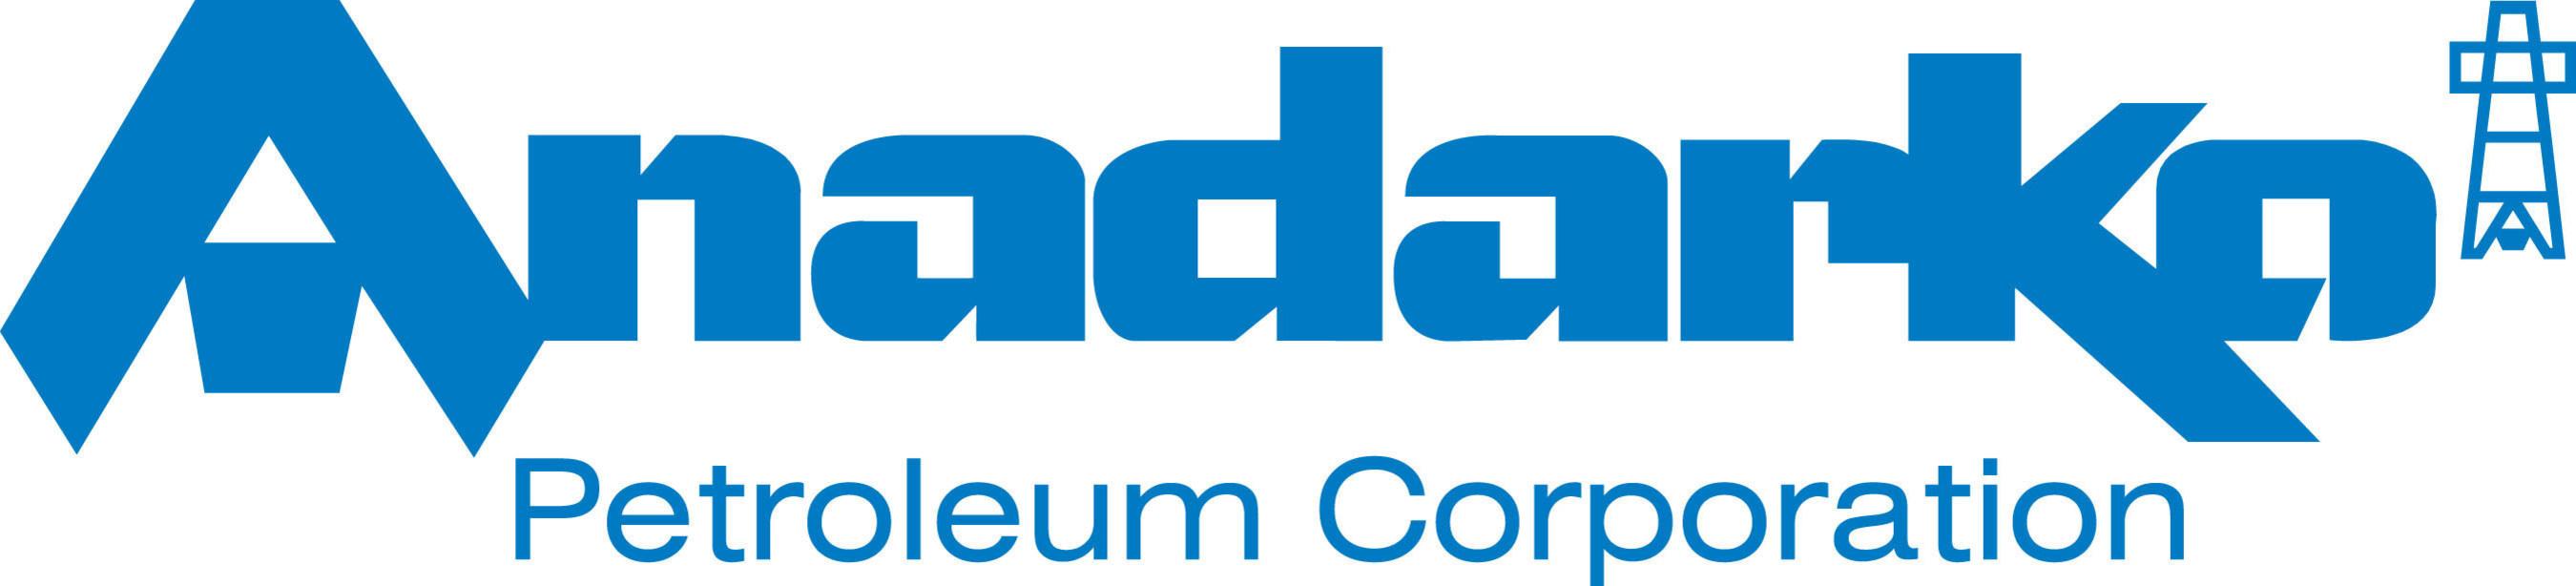 Anadarko Petroleum Corp. Logo (PRNewsFoto/Anadarko Petroleum Corp.) (PRNewsFoto/Anadarko Petroleum Corp.) (PRNewsFoto/Anadarko Petroleum Corp.)